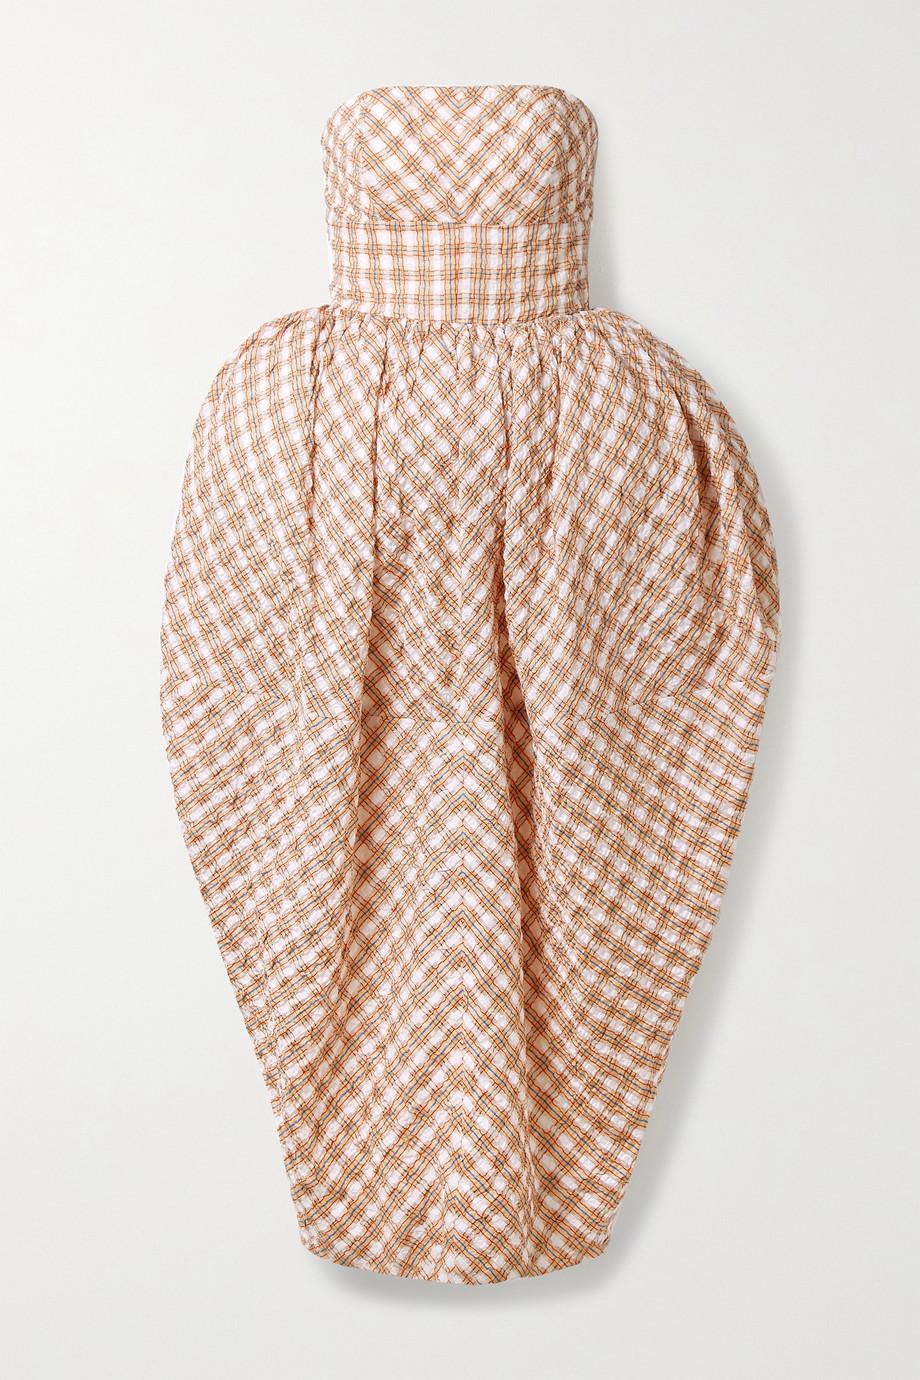 Christopher John Rogers Trägerlose Robe aus kariertem Seersucker